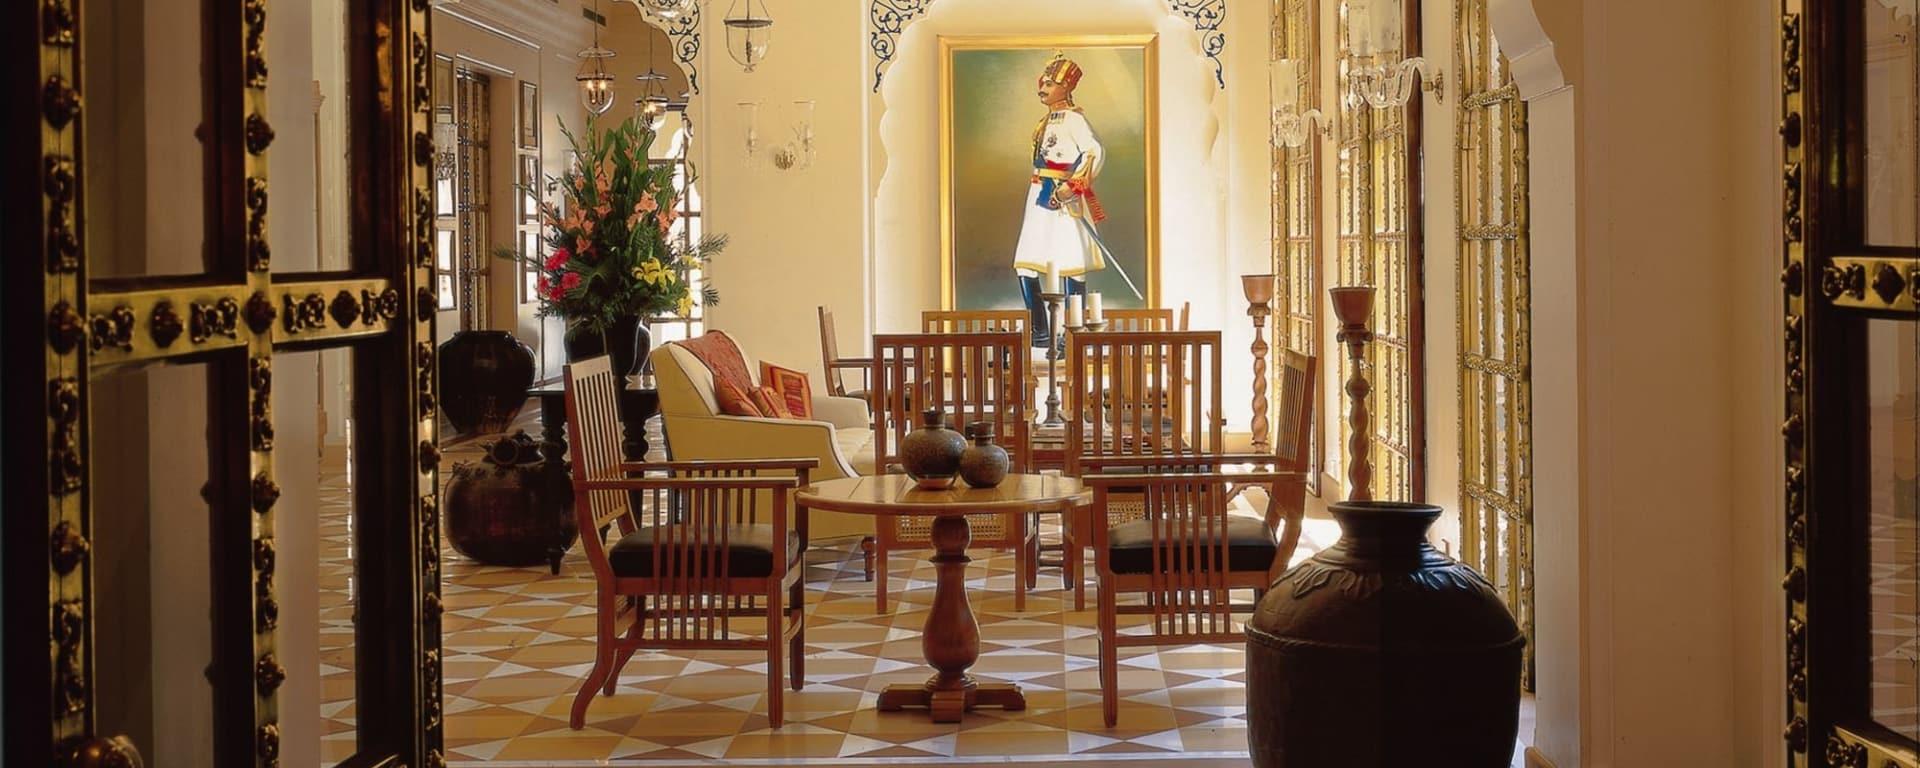 The Oberoi Rajvilas in Jaipur: Lobby